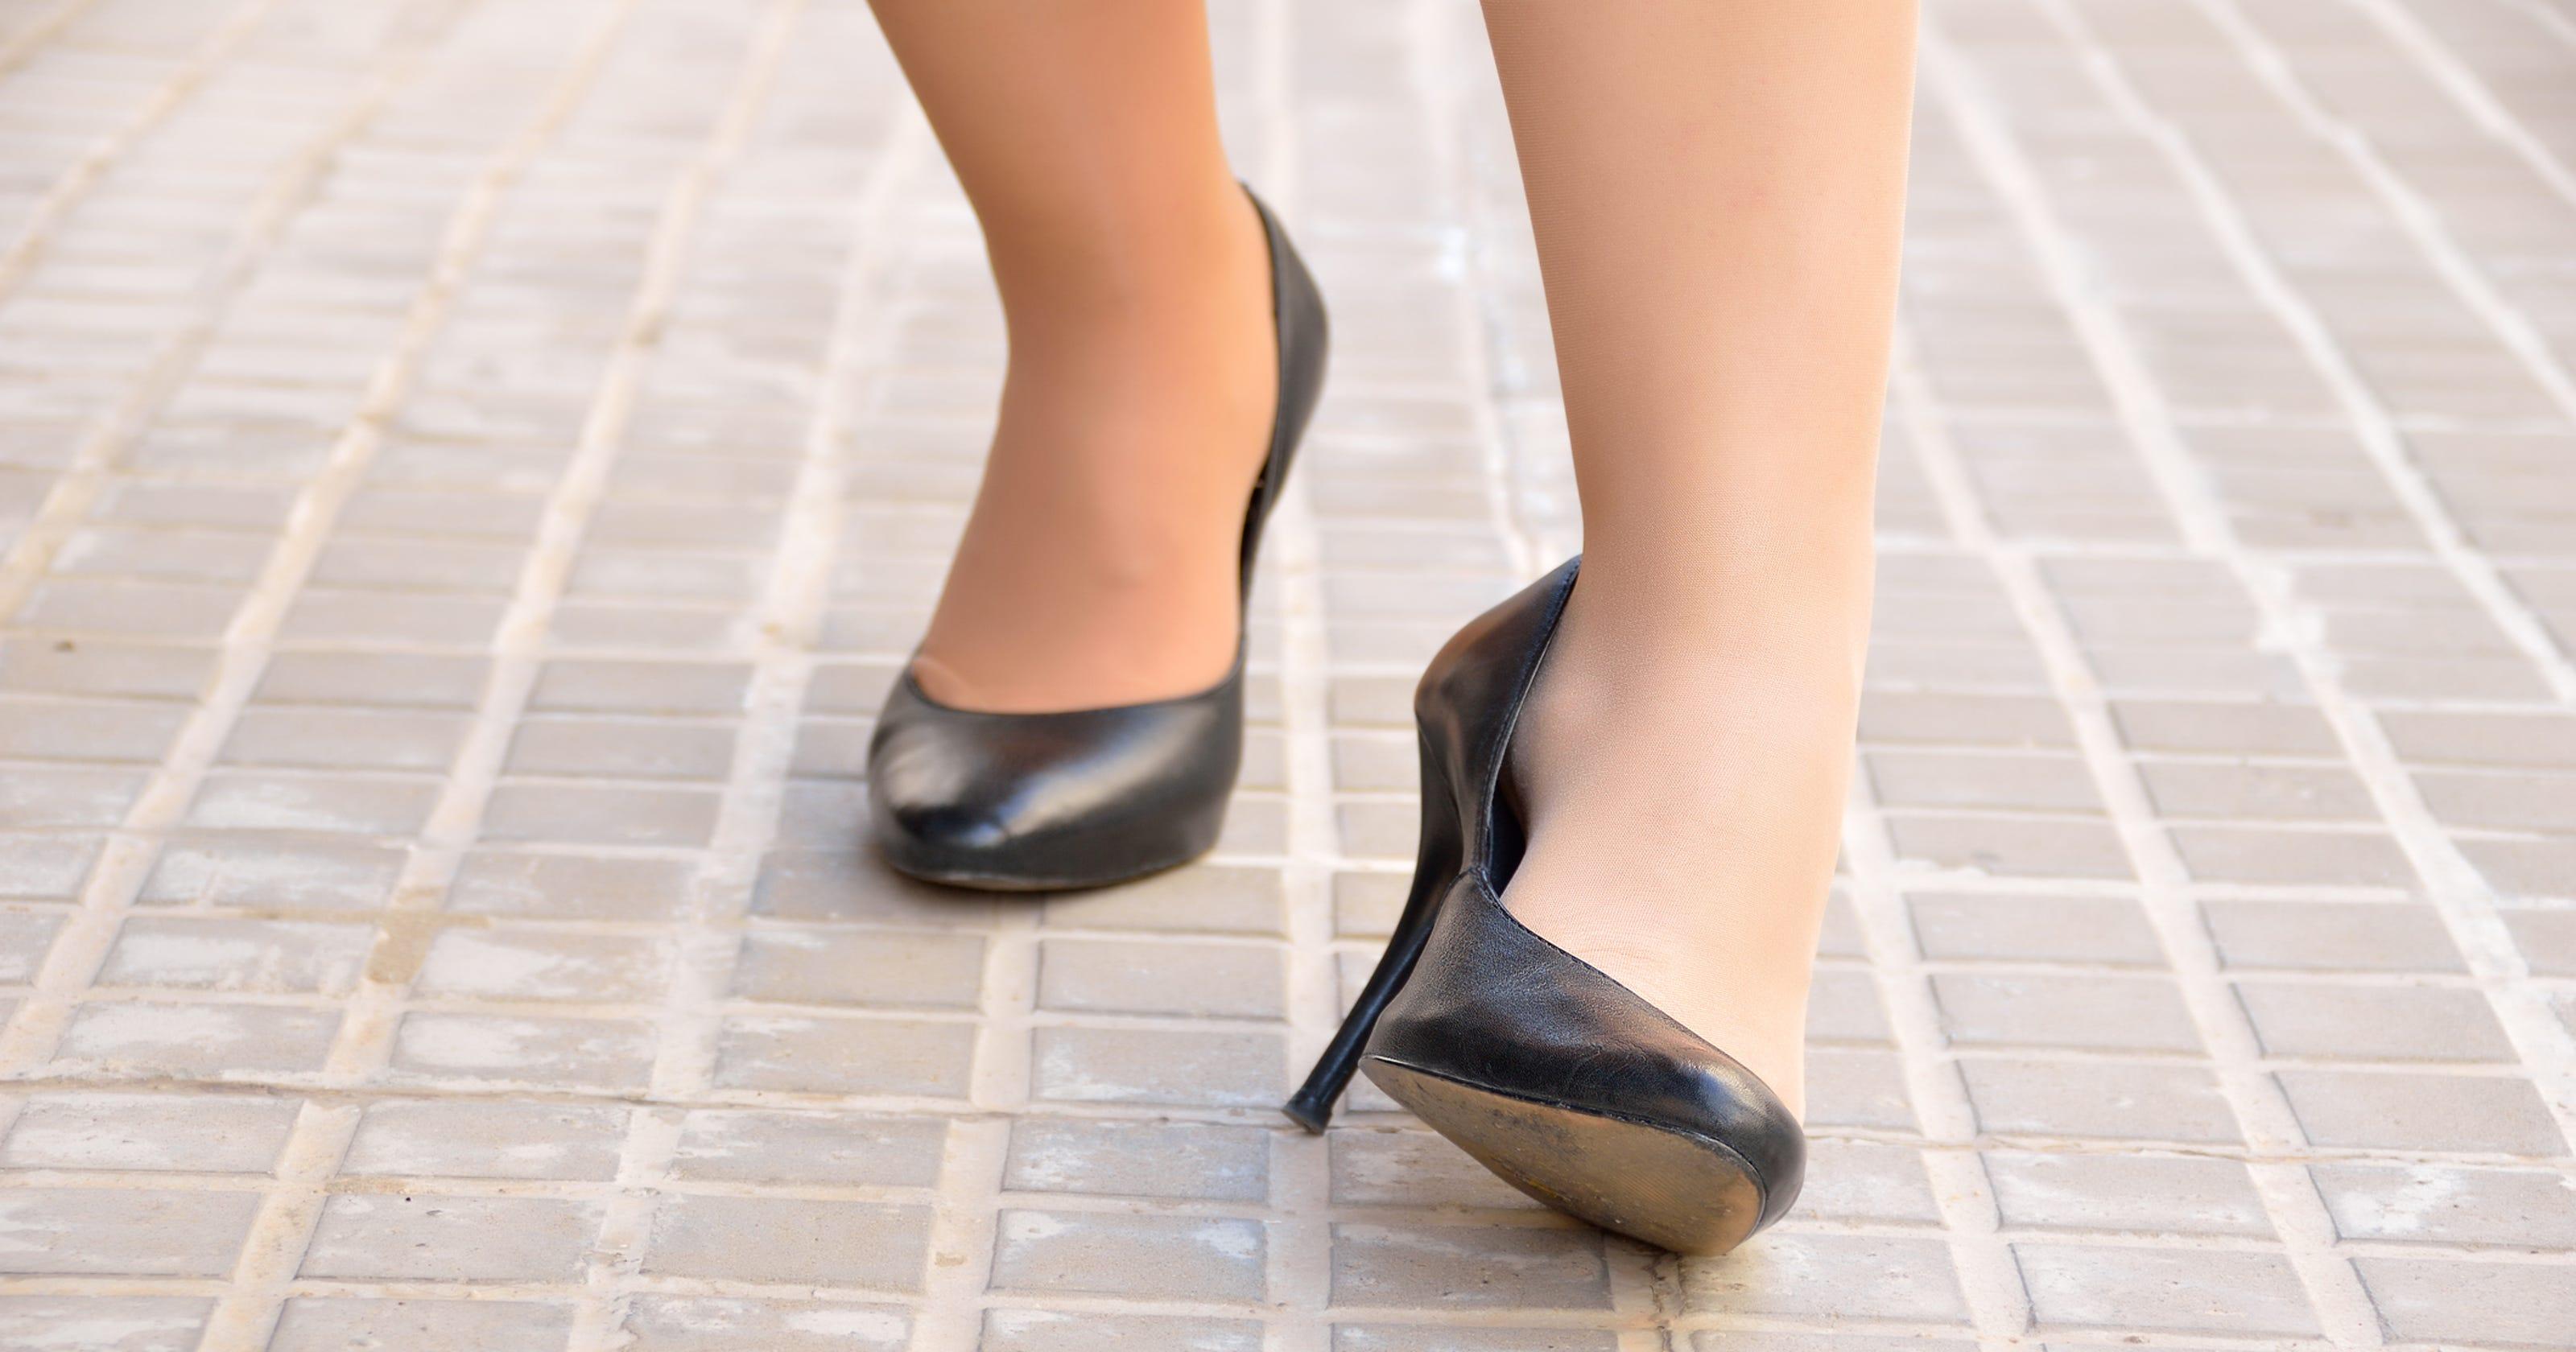 c5f2ec00f80 Sneaker sales are growing as sales of high heels tumble: Report